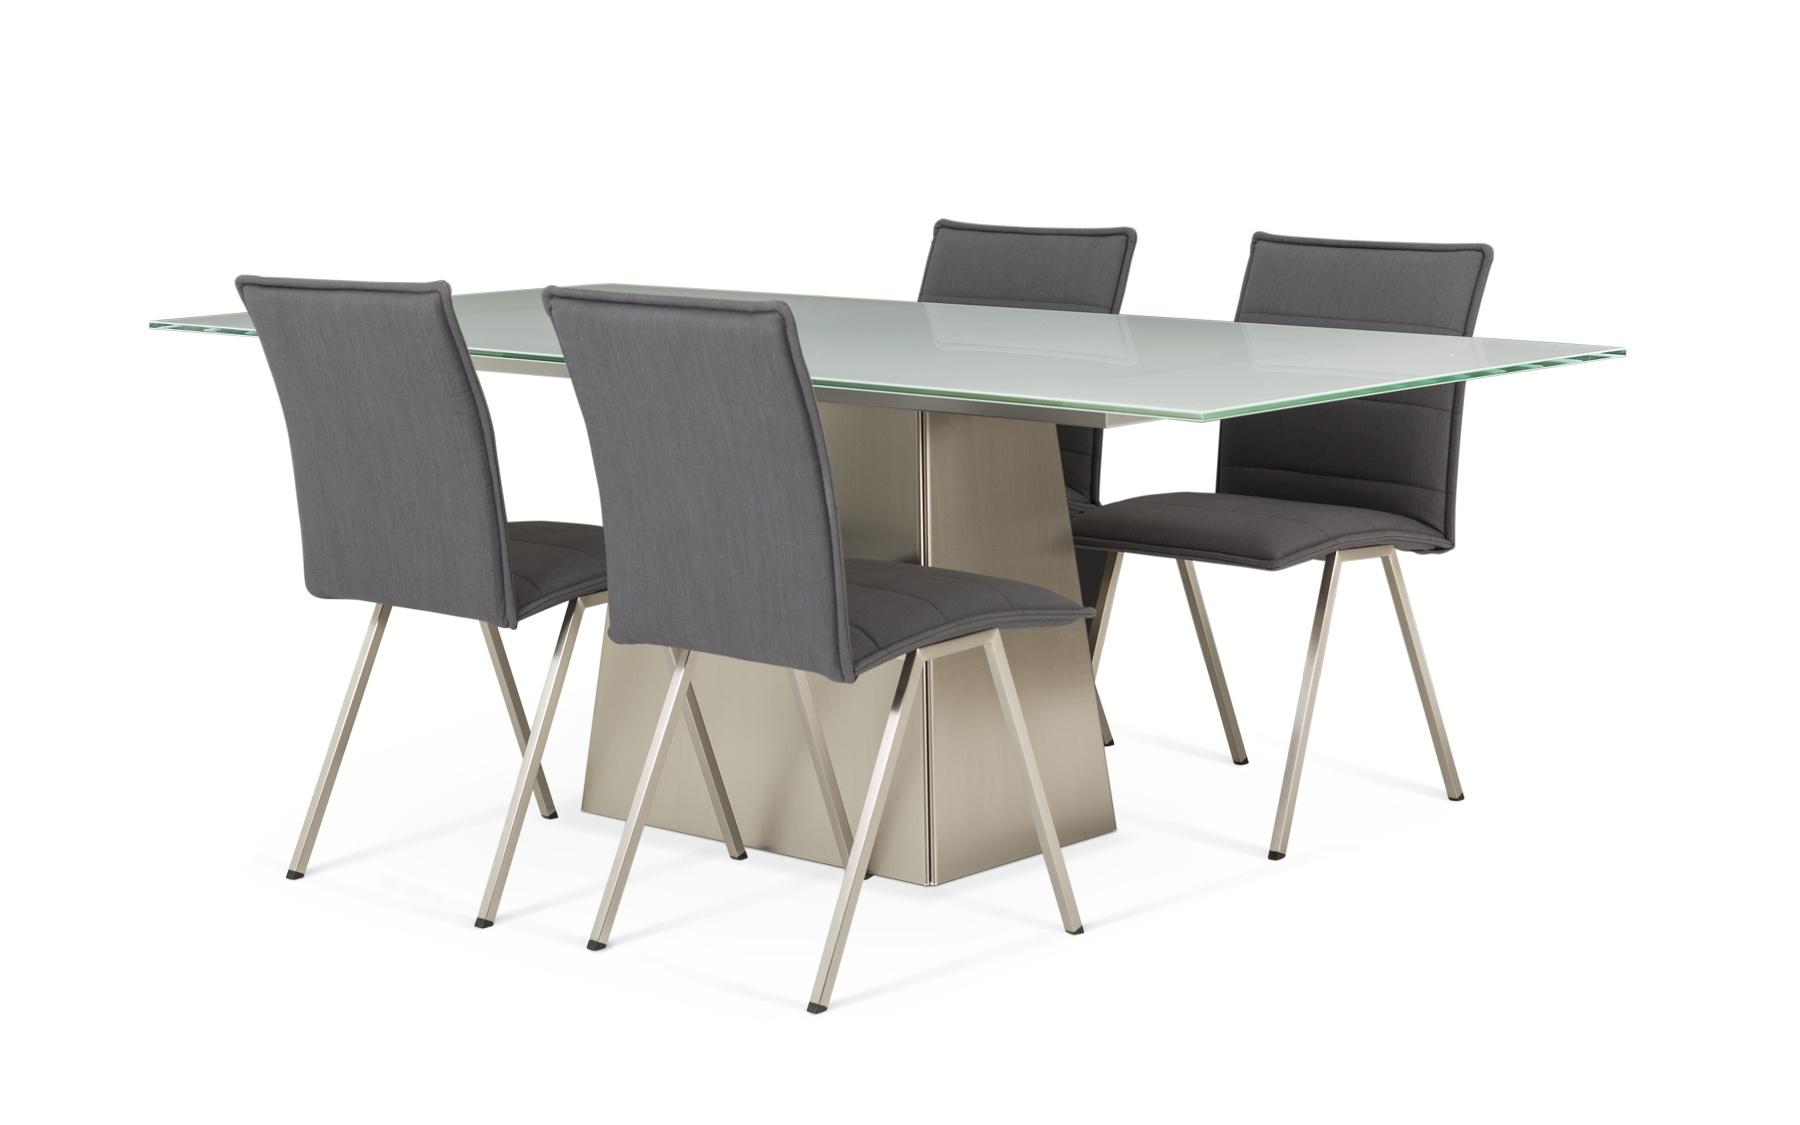 Table 84x40 co479 tables salles manger la galerie for Gallerie du meuble